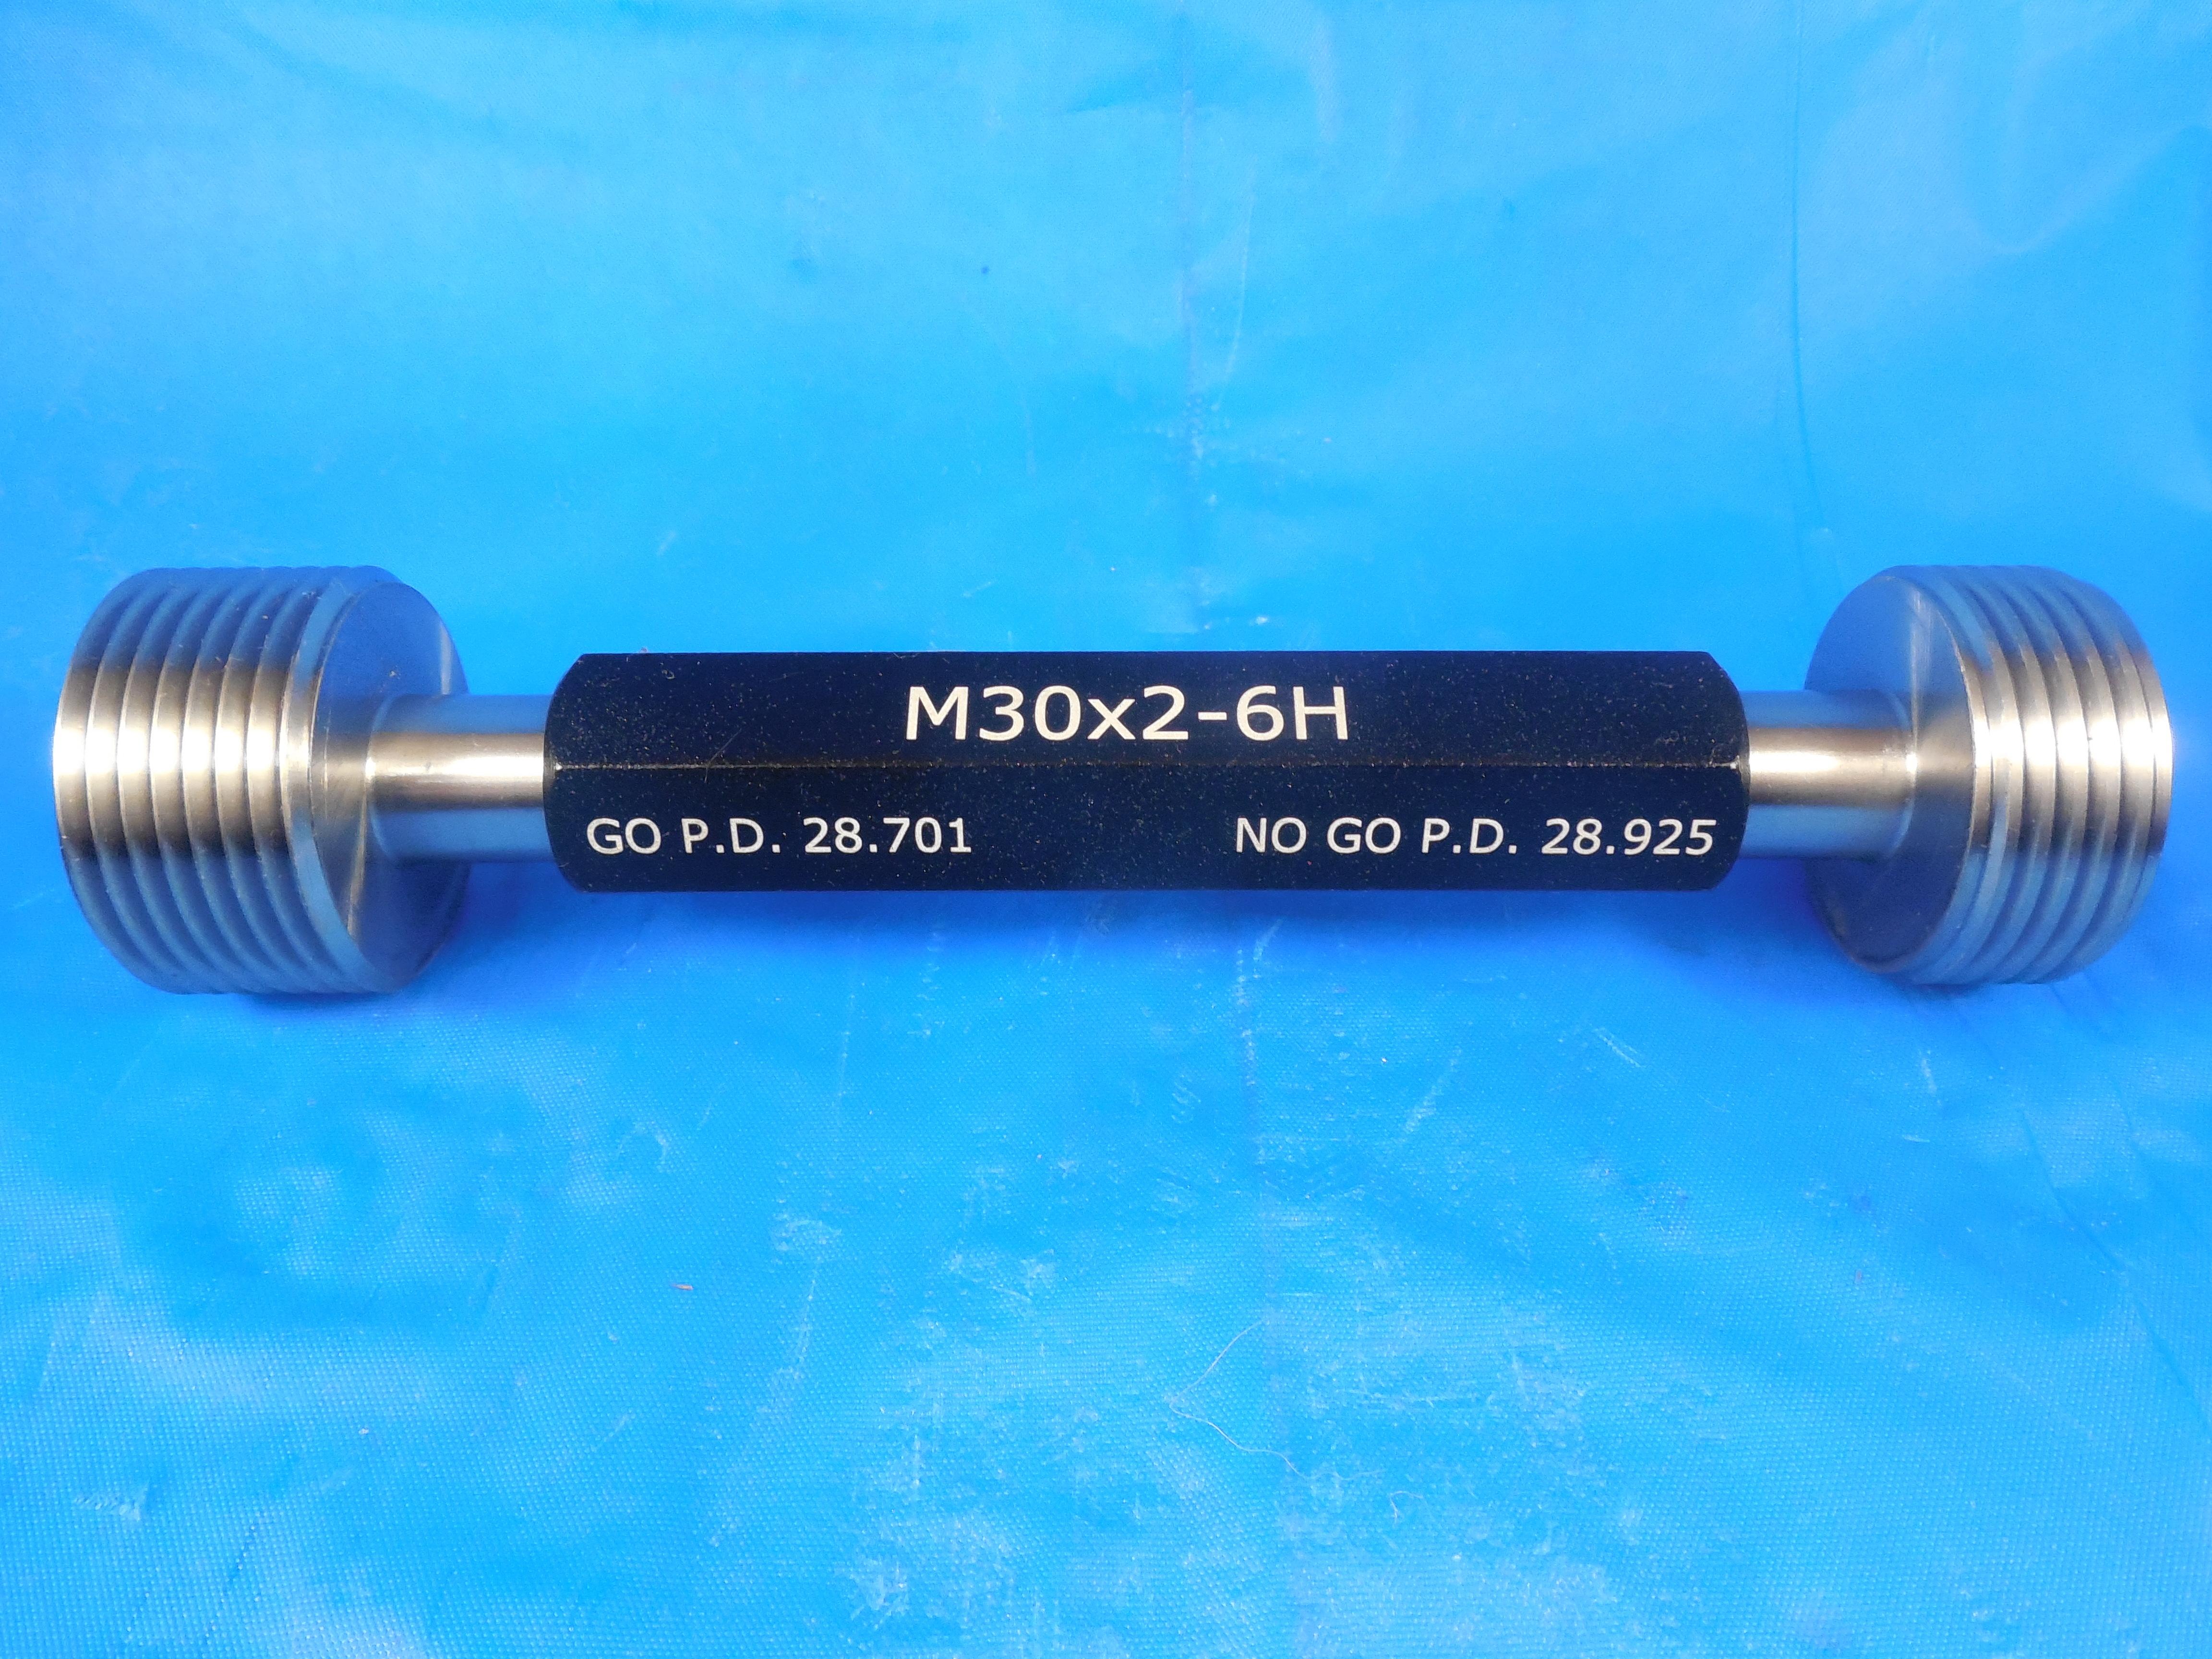 NEW M30 X 3.5 6H METRIC THREAD PLUG GAGE 30.0 3.50 GO NO GO PD/'S 27.727 /& 28.007